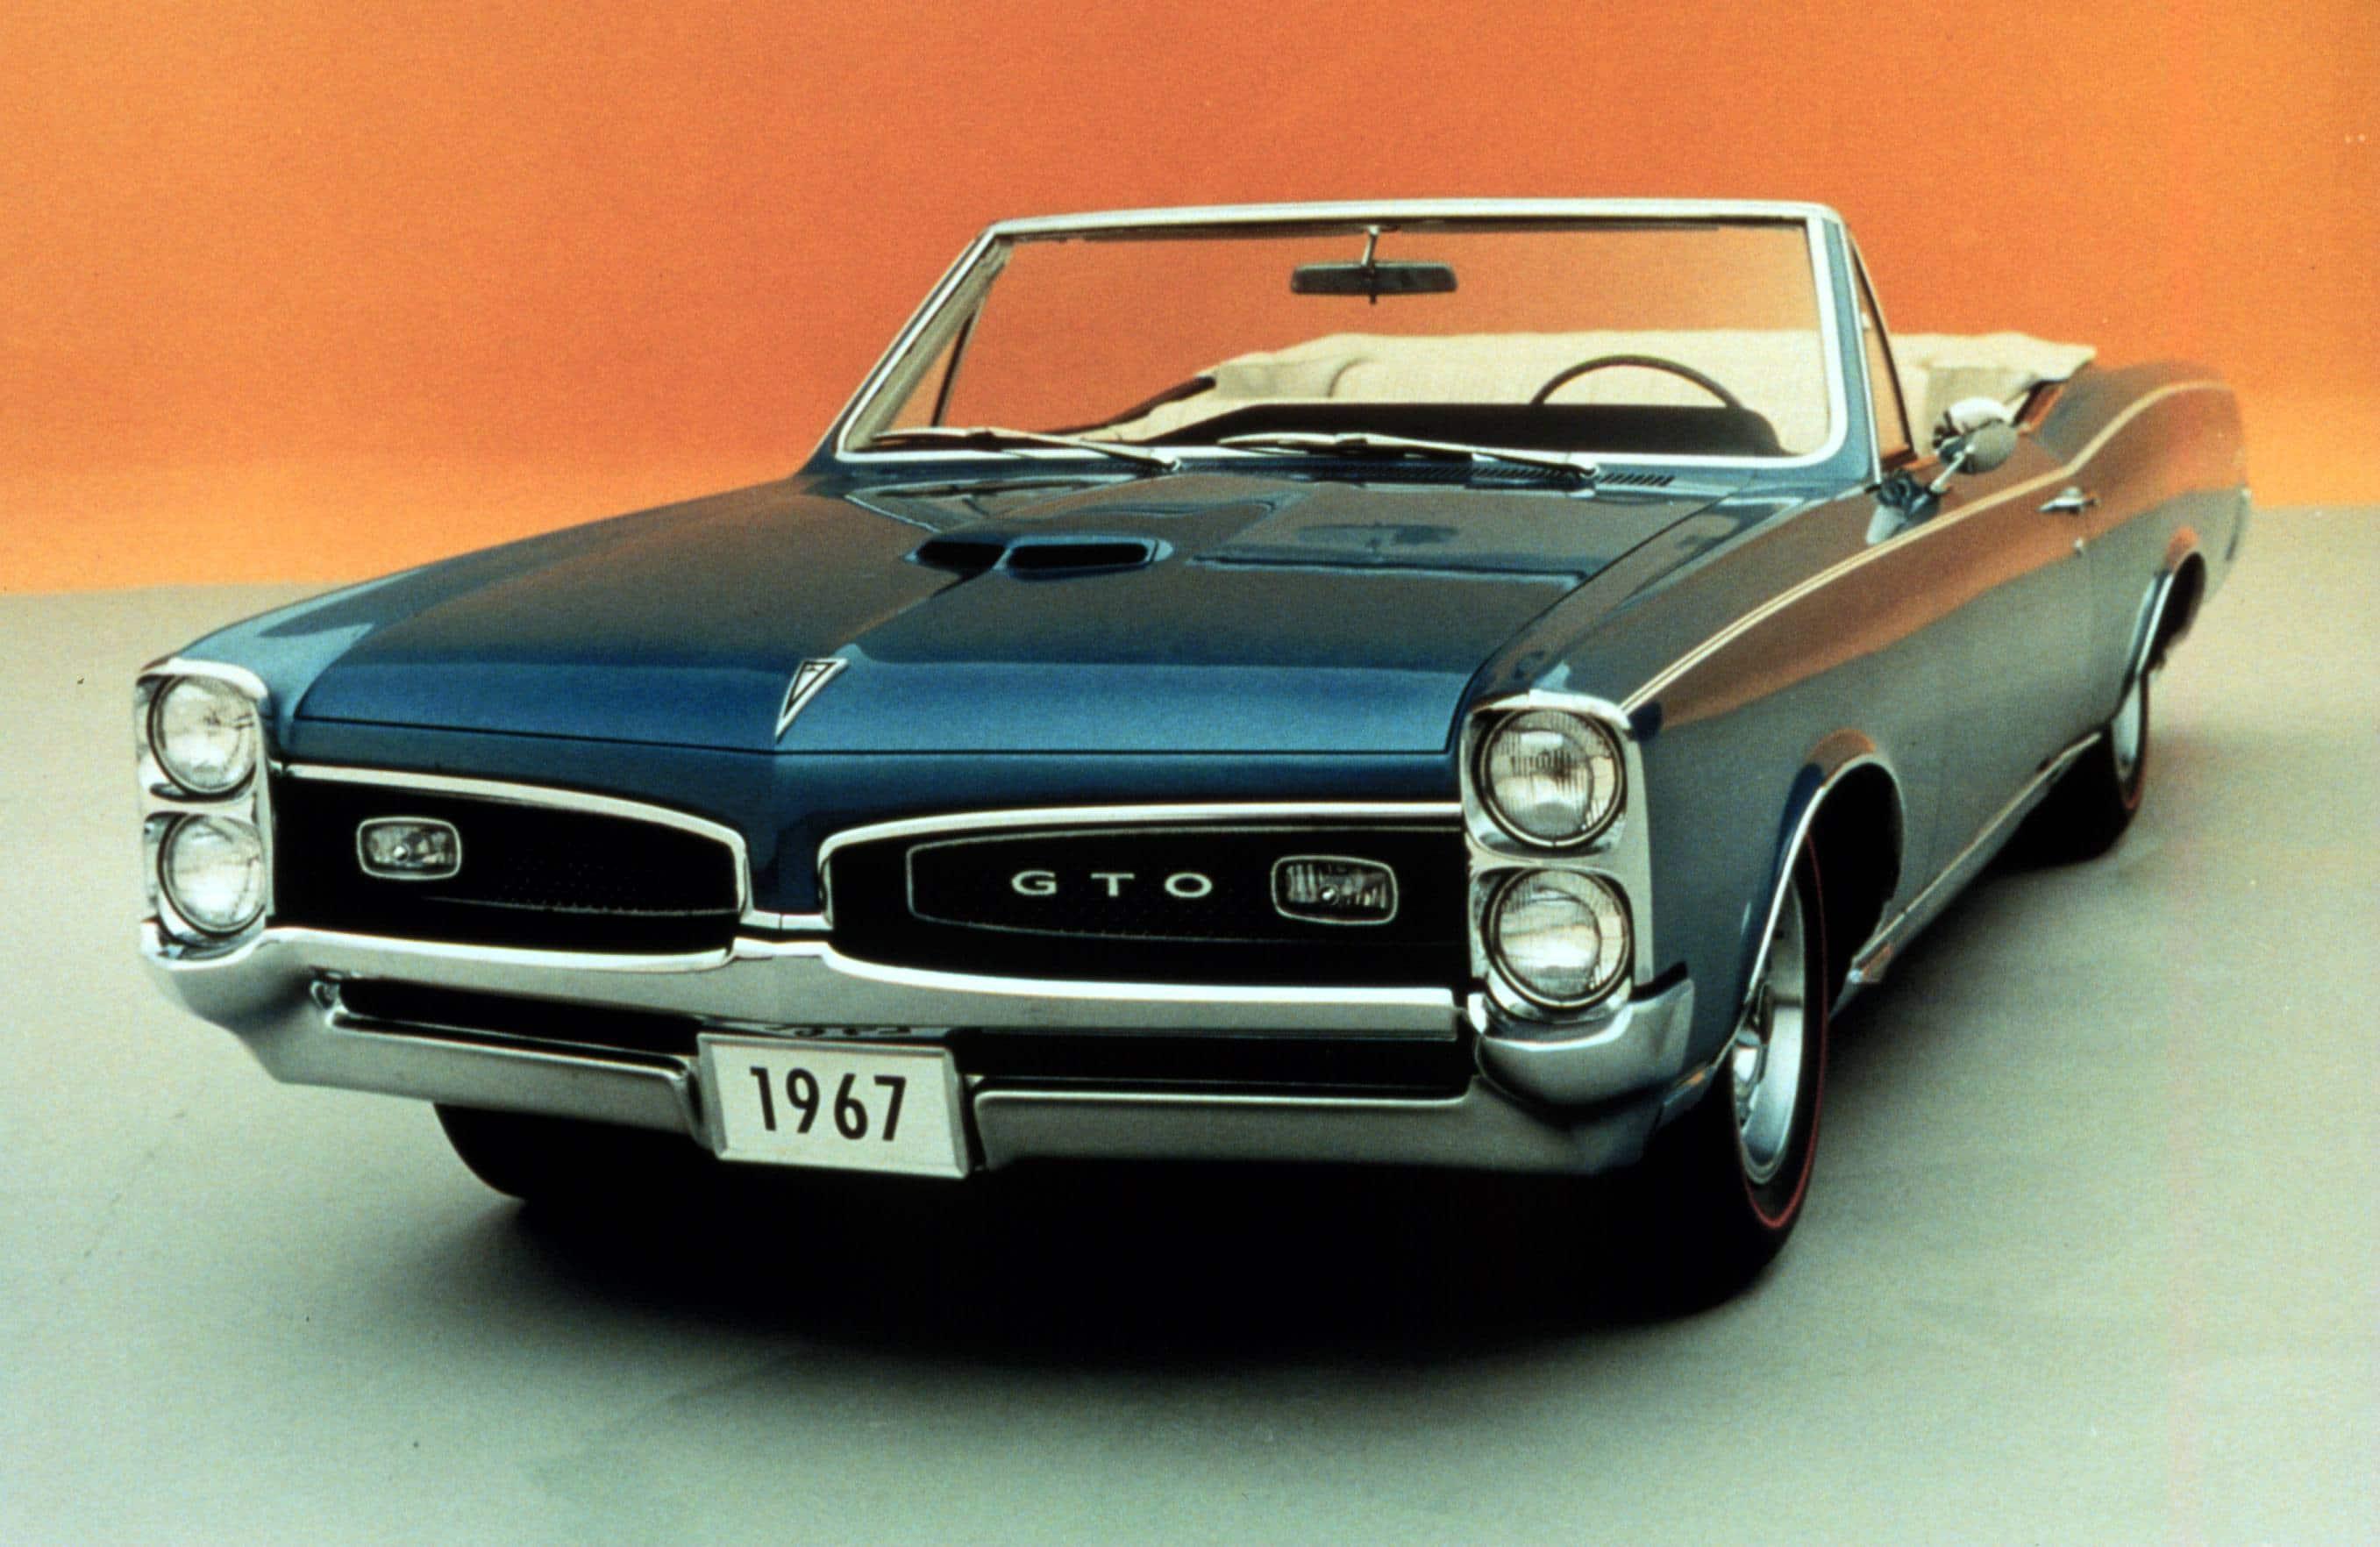 Pontiac Gto 2014 >> Birth Of The Muscle Car The Pontiac Gto At 50